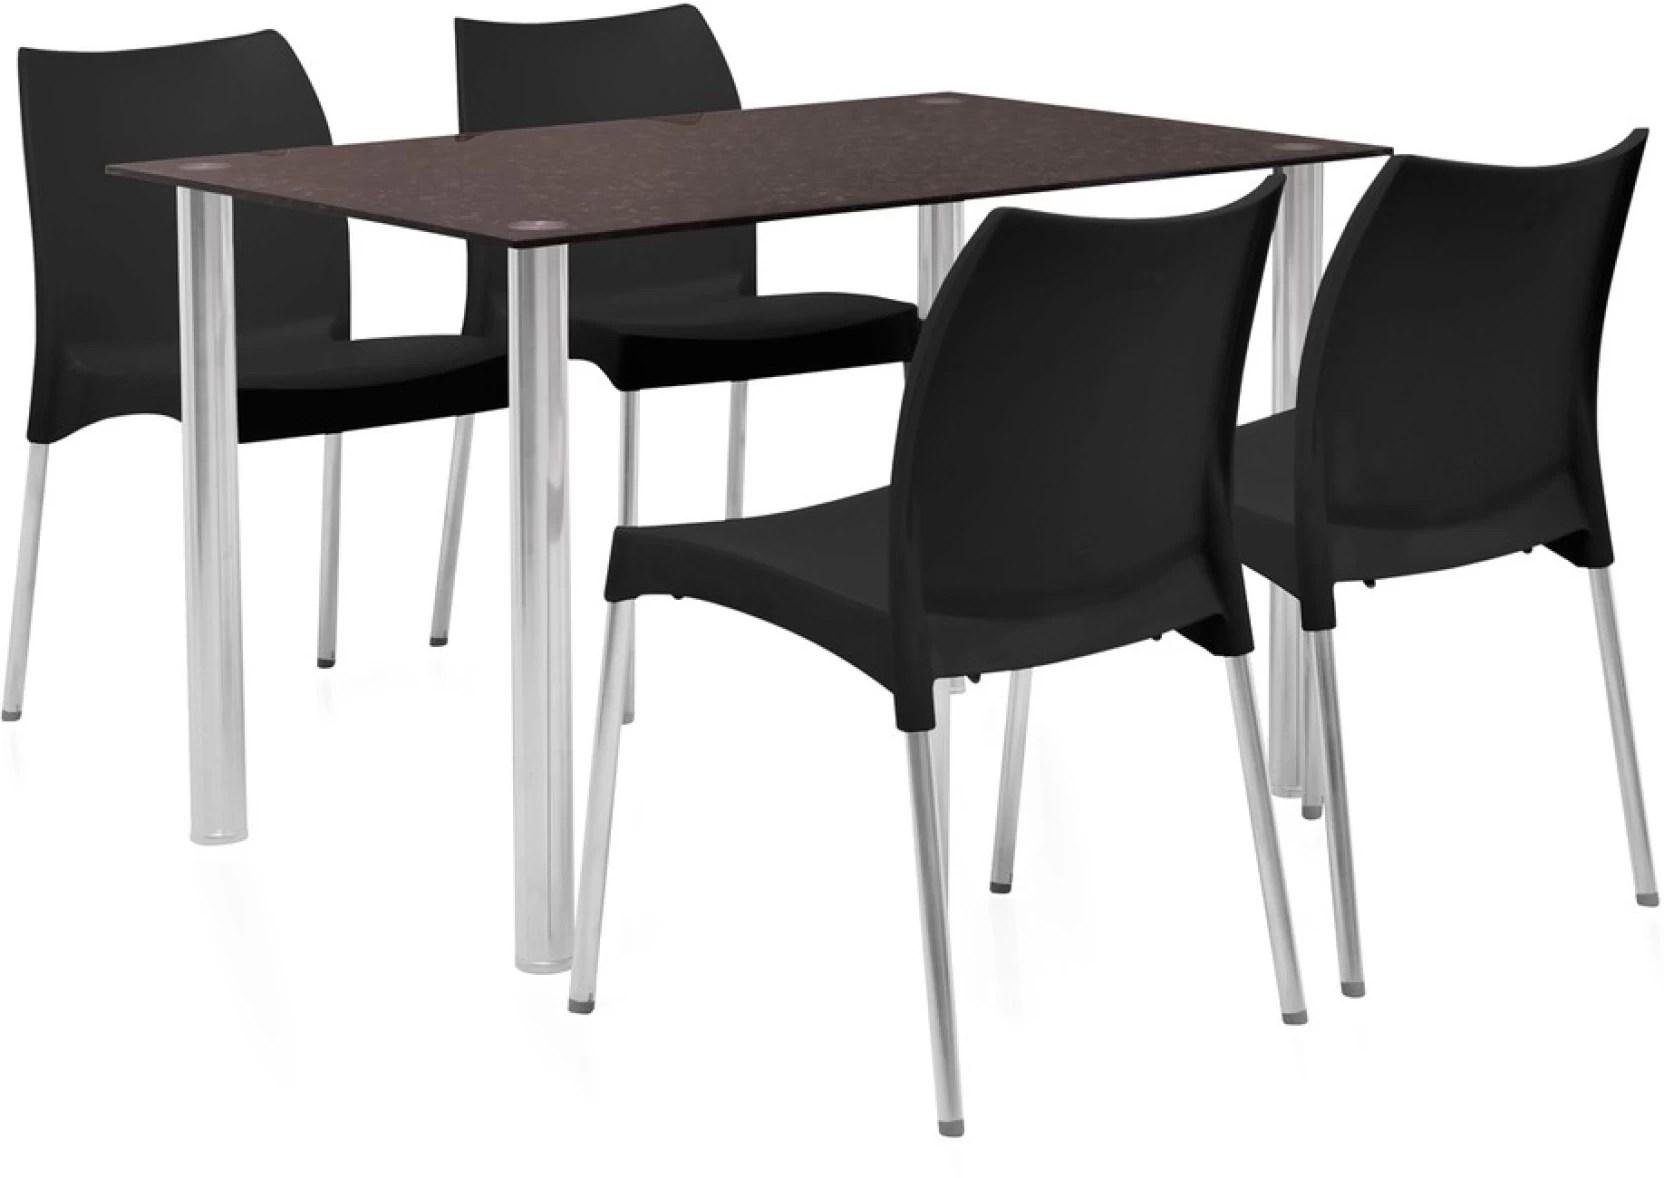 steel chair flipkart striped wingback home by nilkamal napoli glass 4 seater dining set price